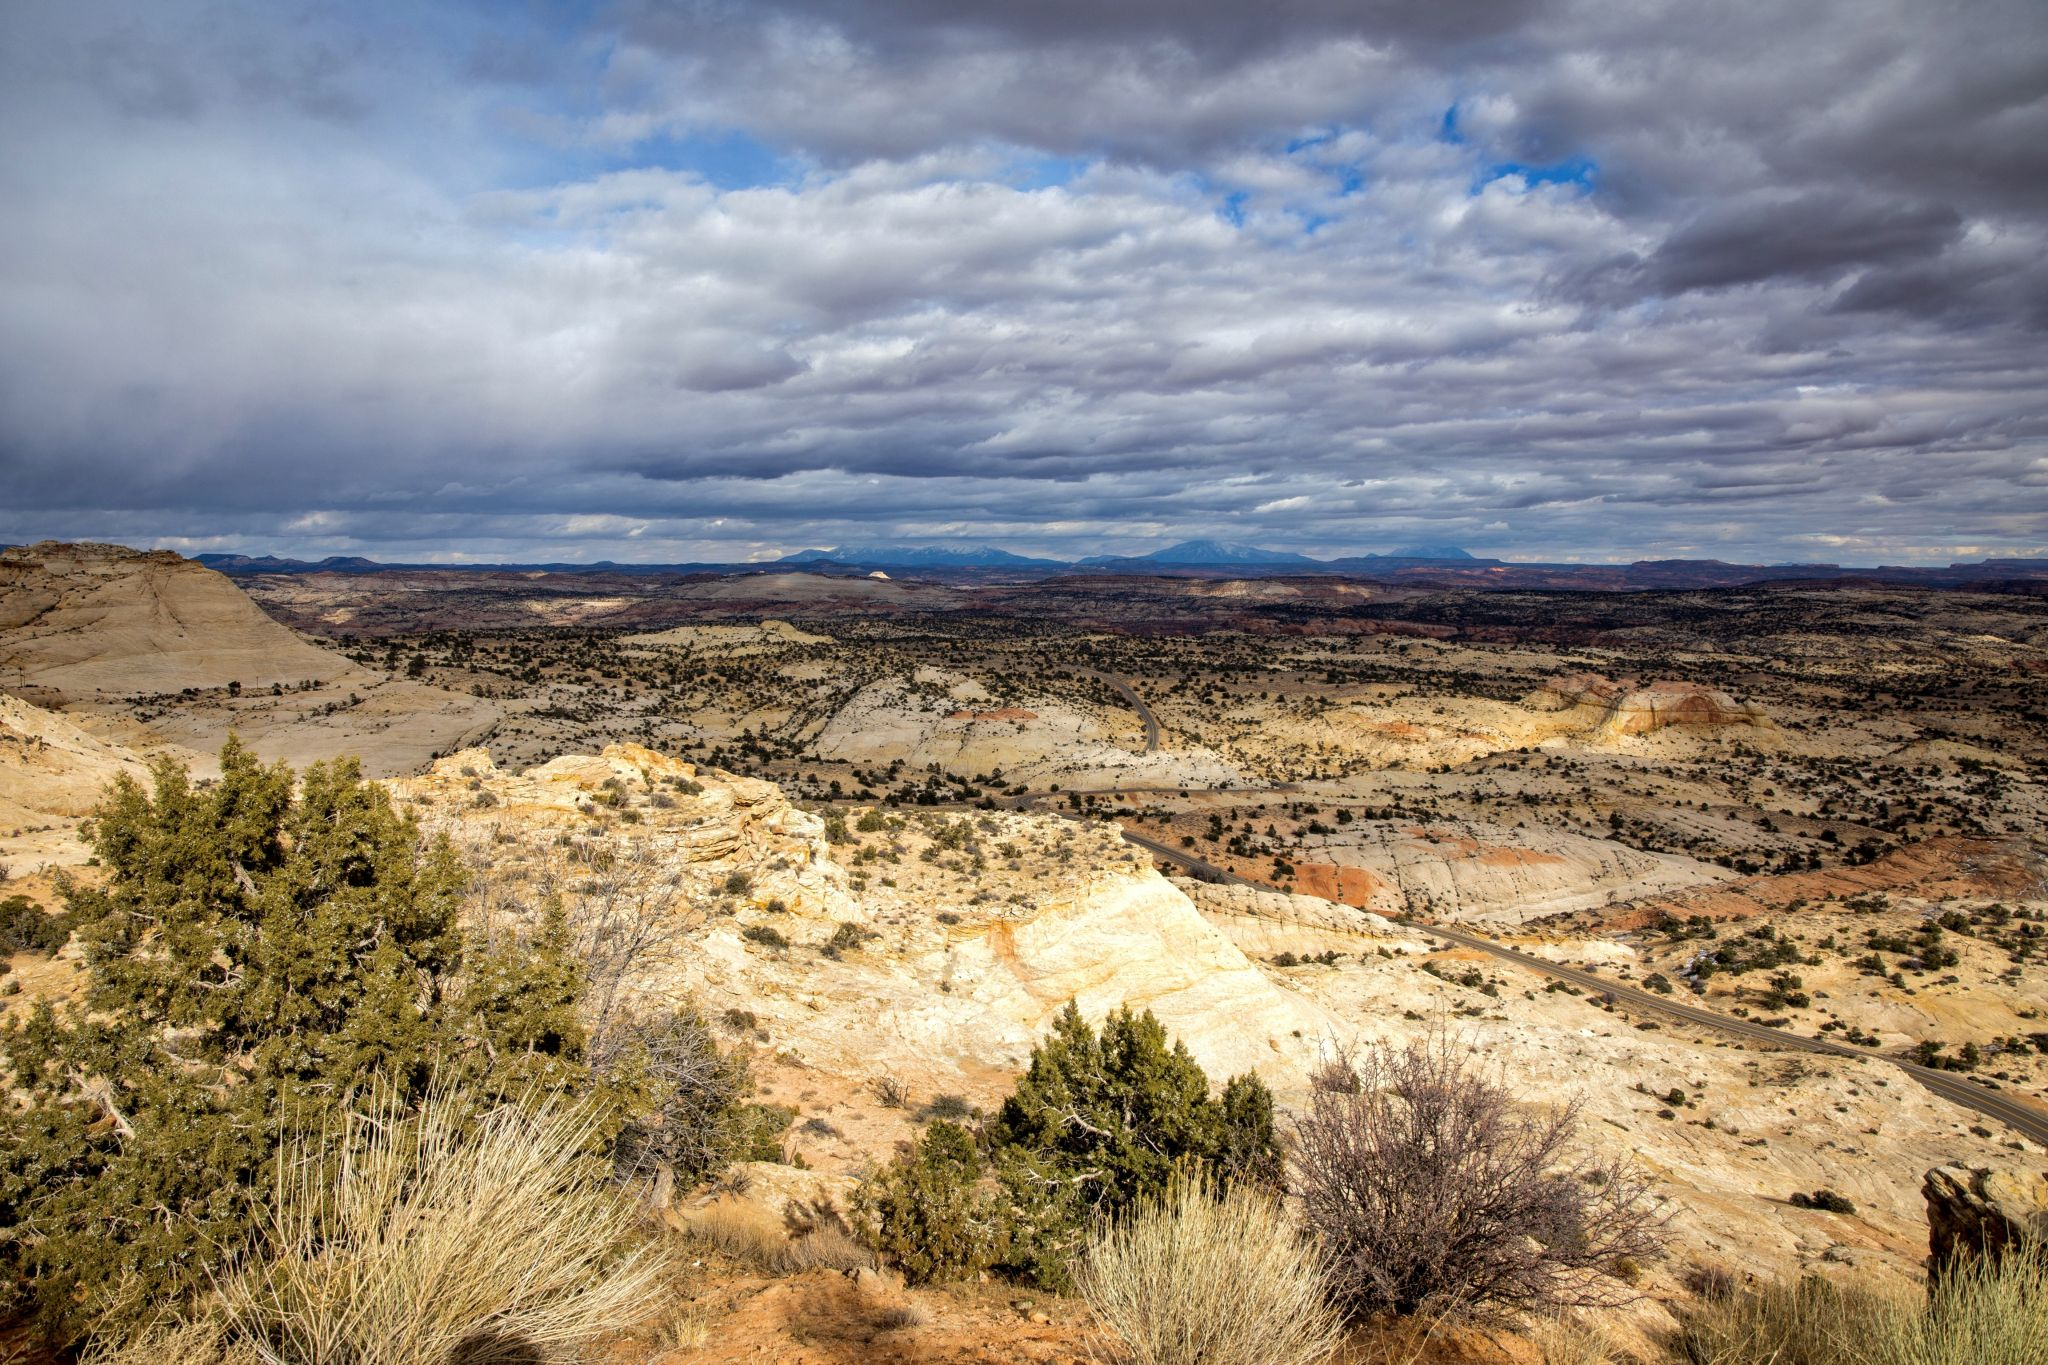 Head of the Rocks Overlook, USA